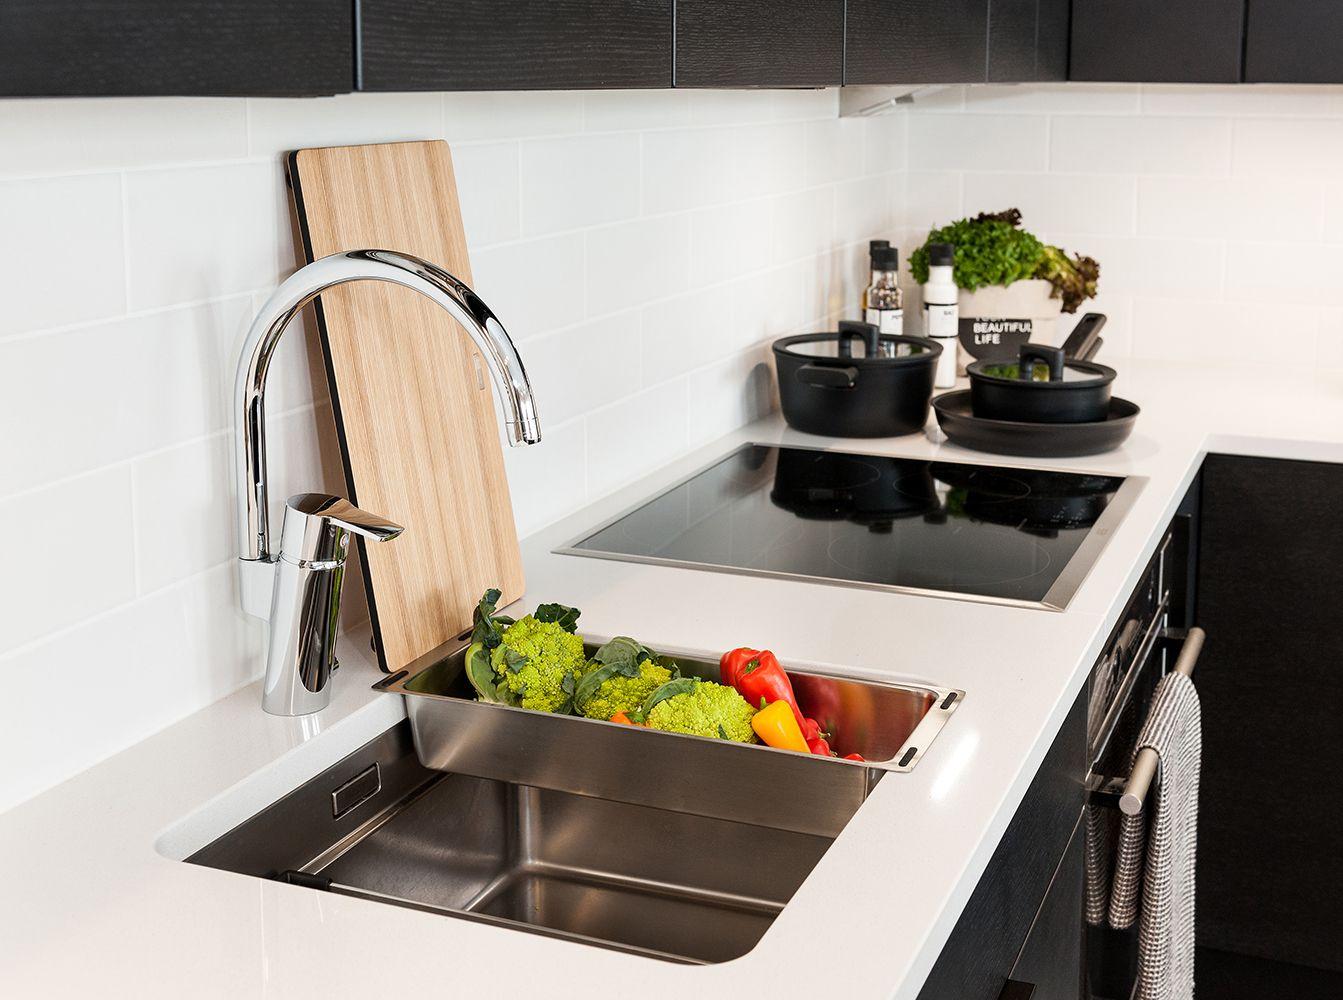 Home Kitchen Dishwasher Dishwasher Tabs Kitchen Faucet